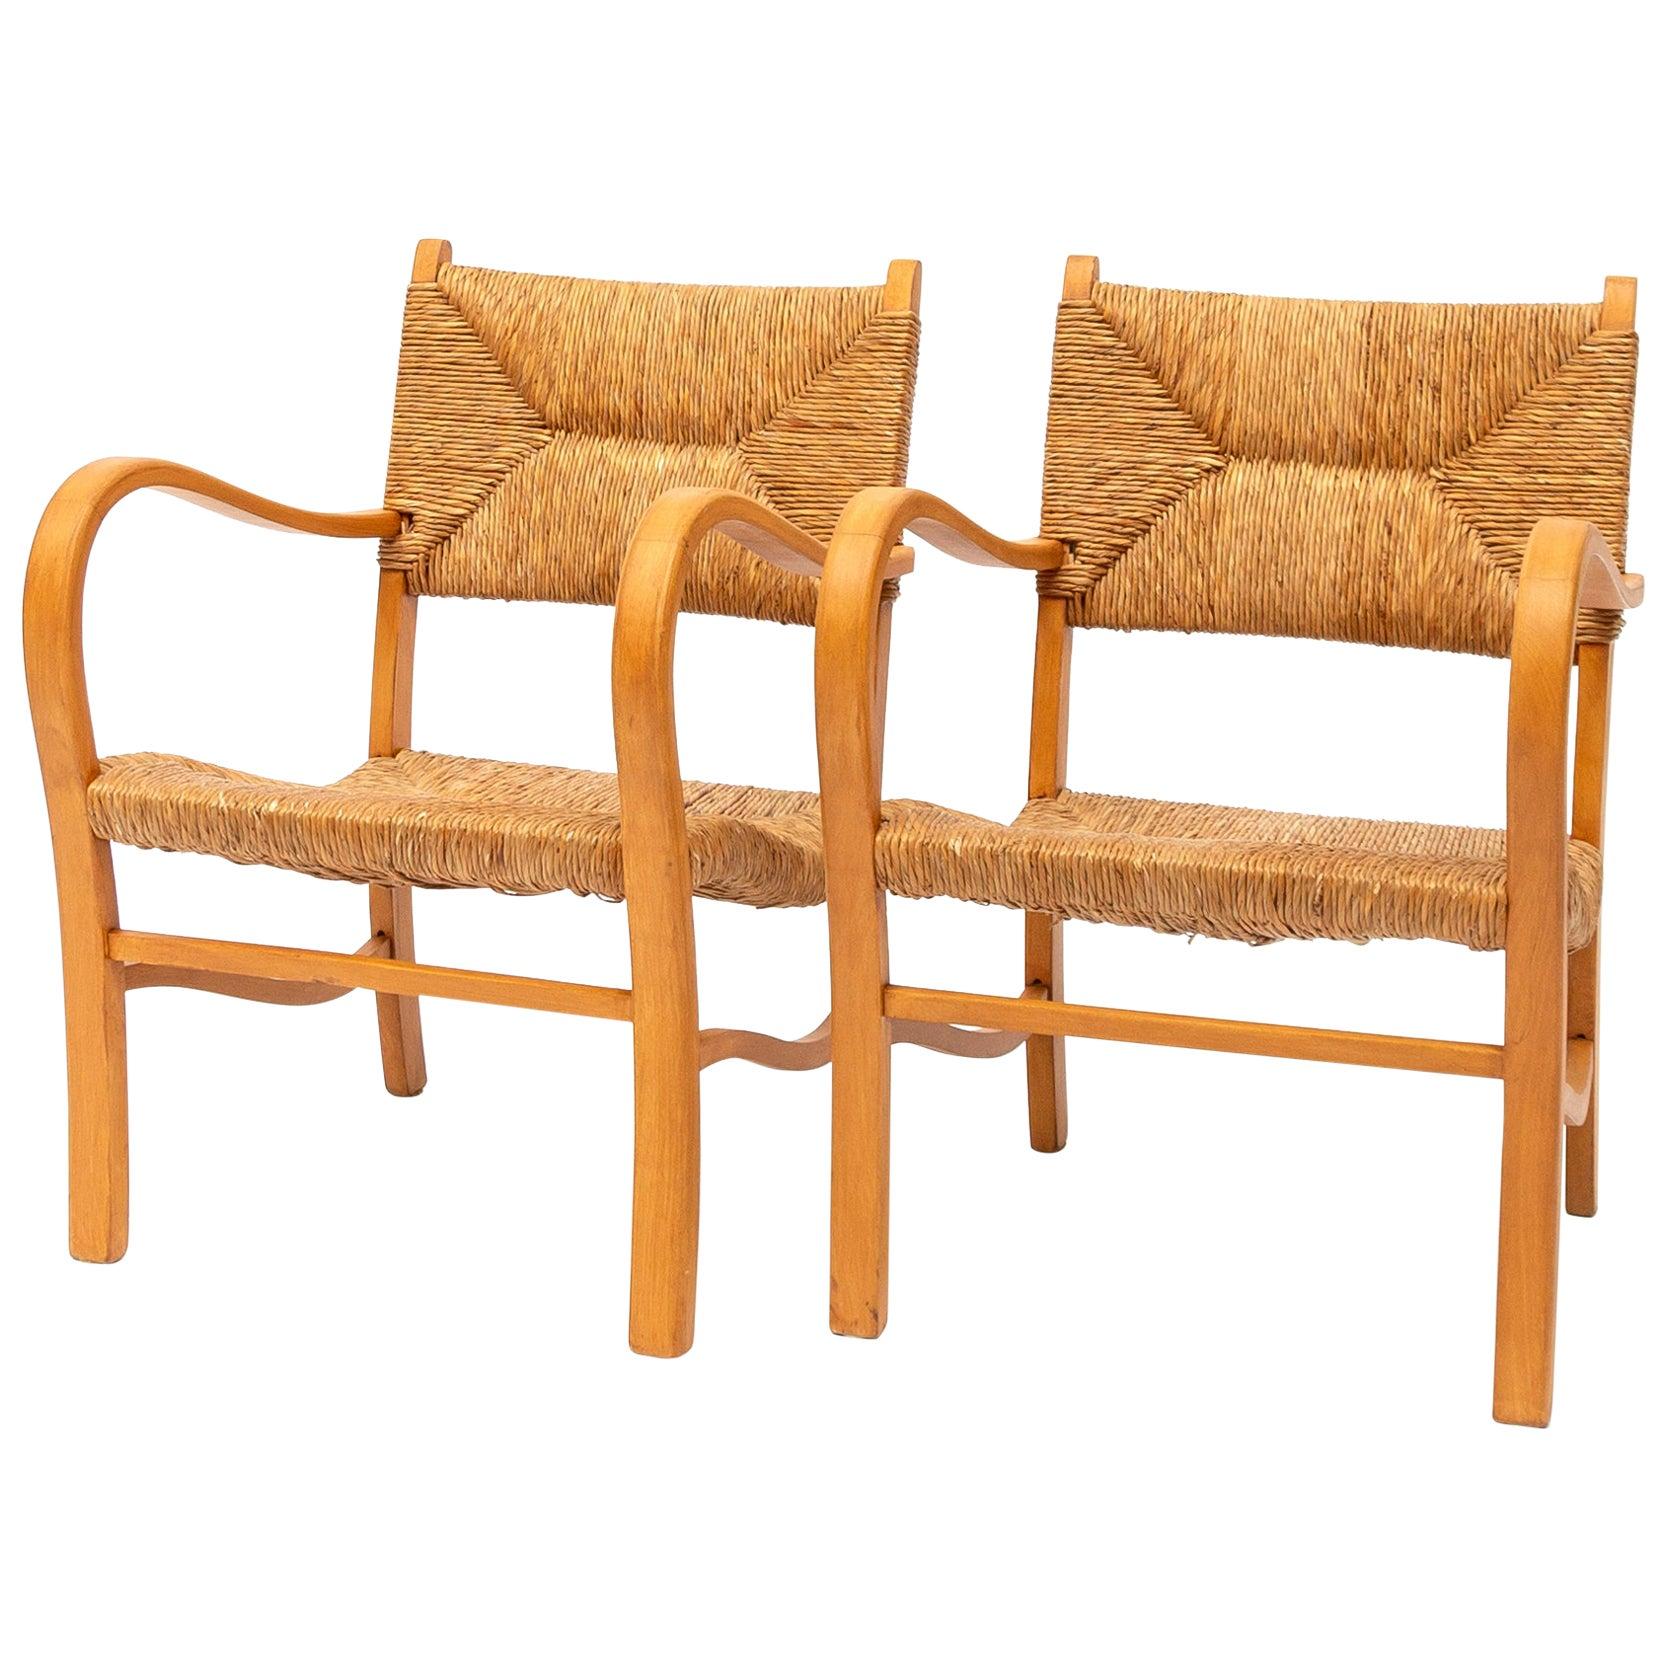 Set of Two Beechwood Rattan Chairs, 1960s